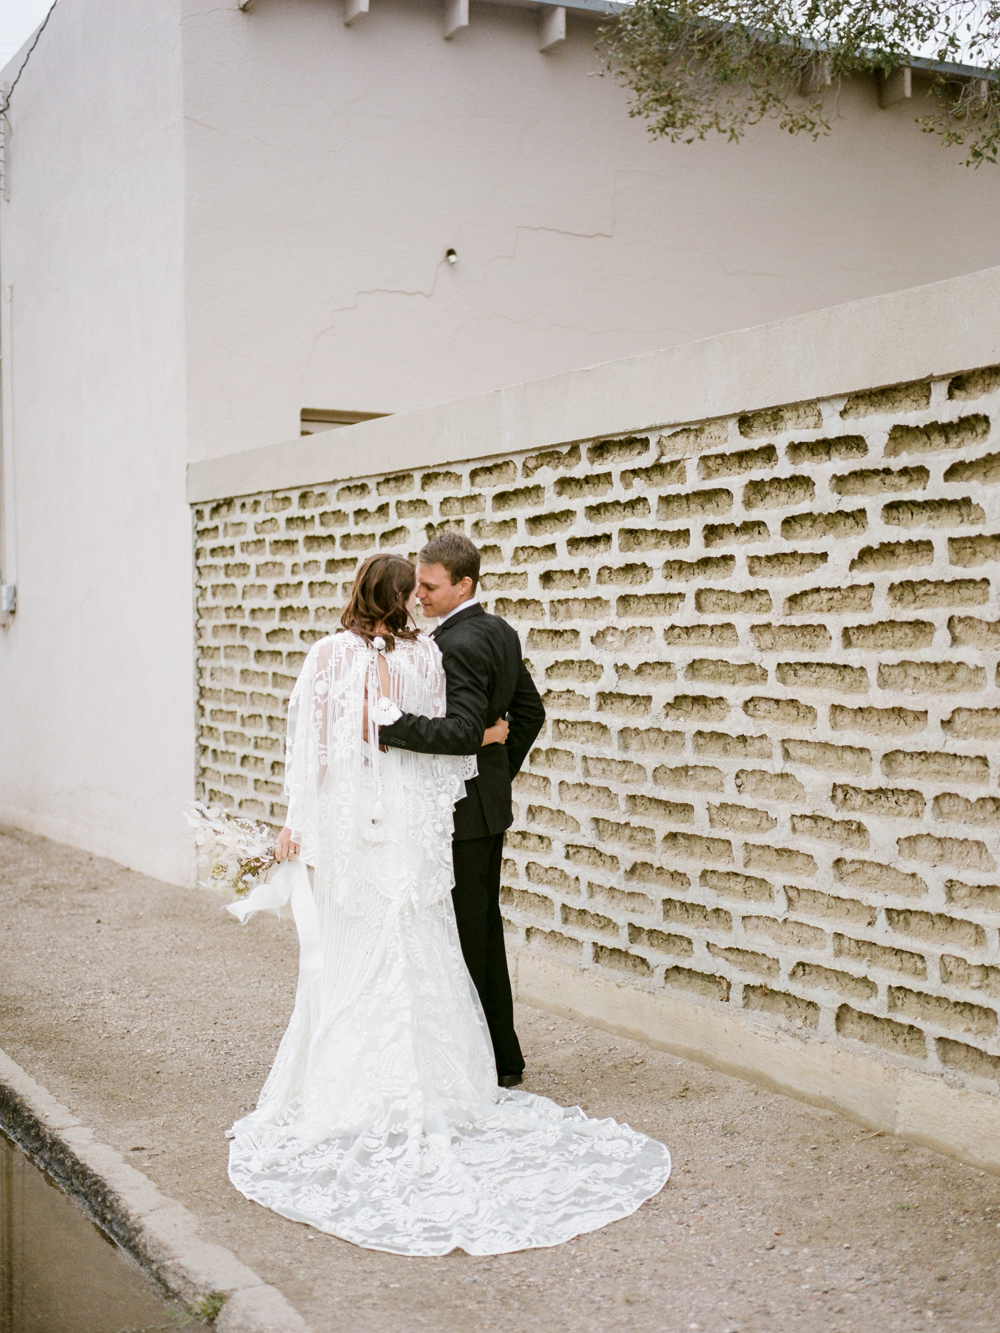 Marfa wedding photographer- destination wedding photographer-christine gosch - film photographer - elopement photographer-23.jpg